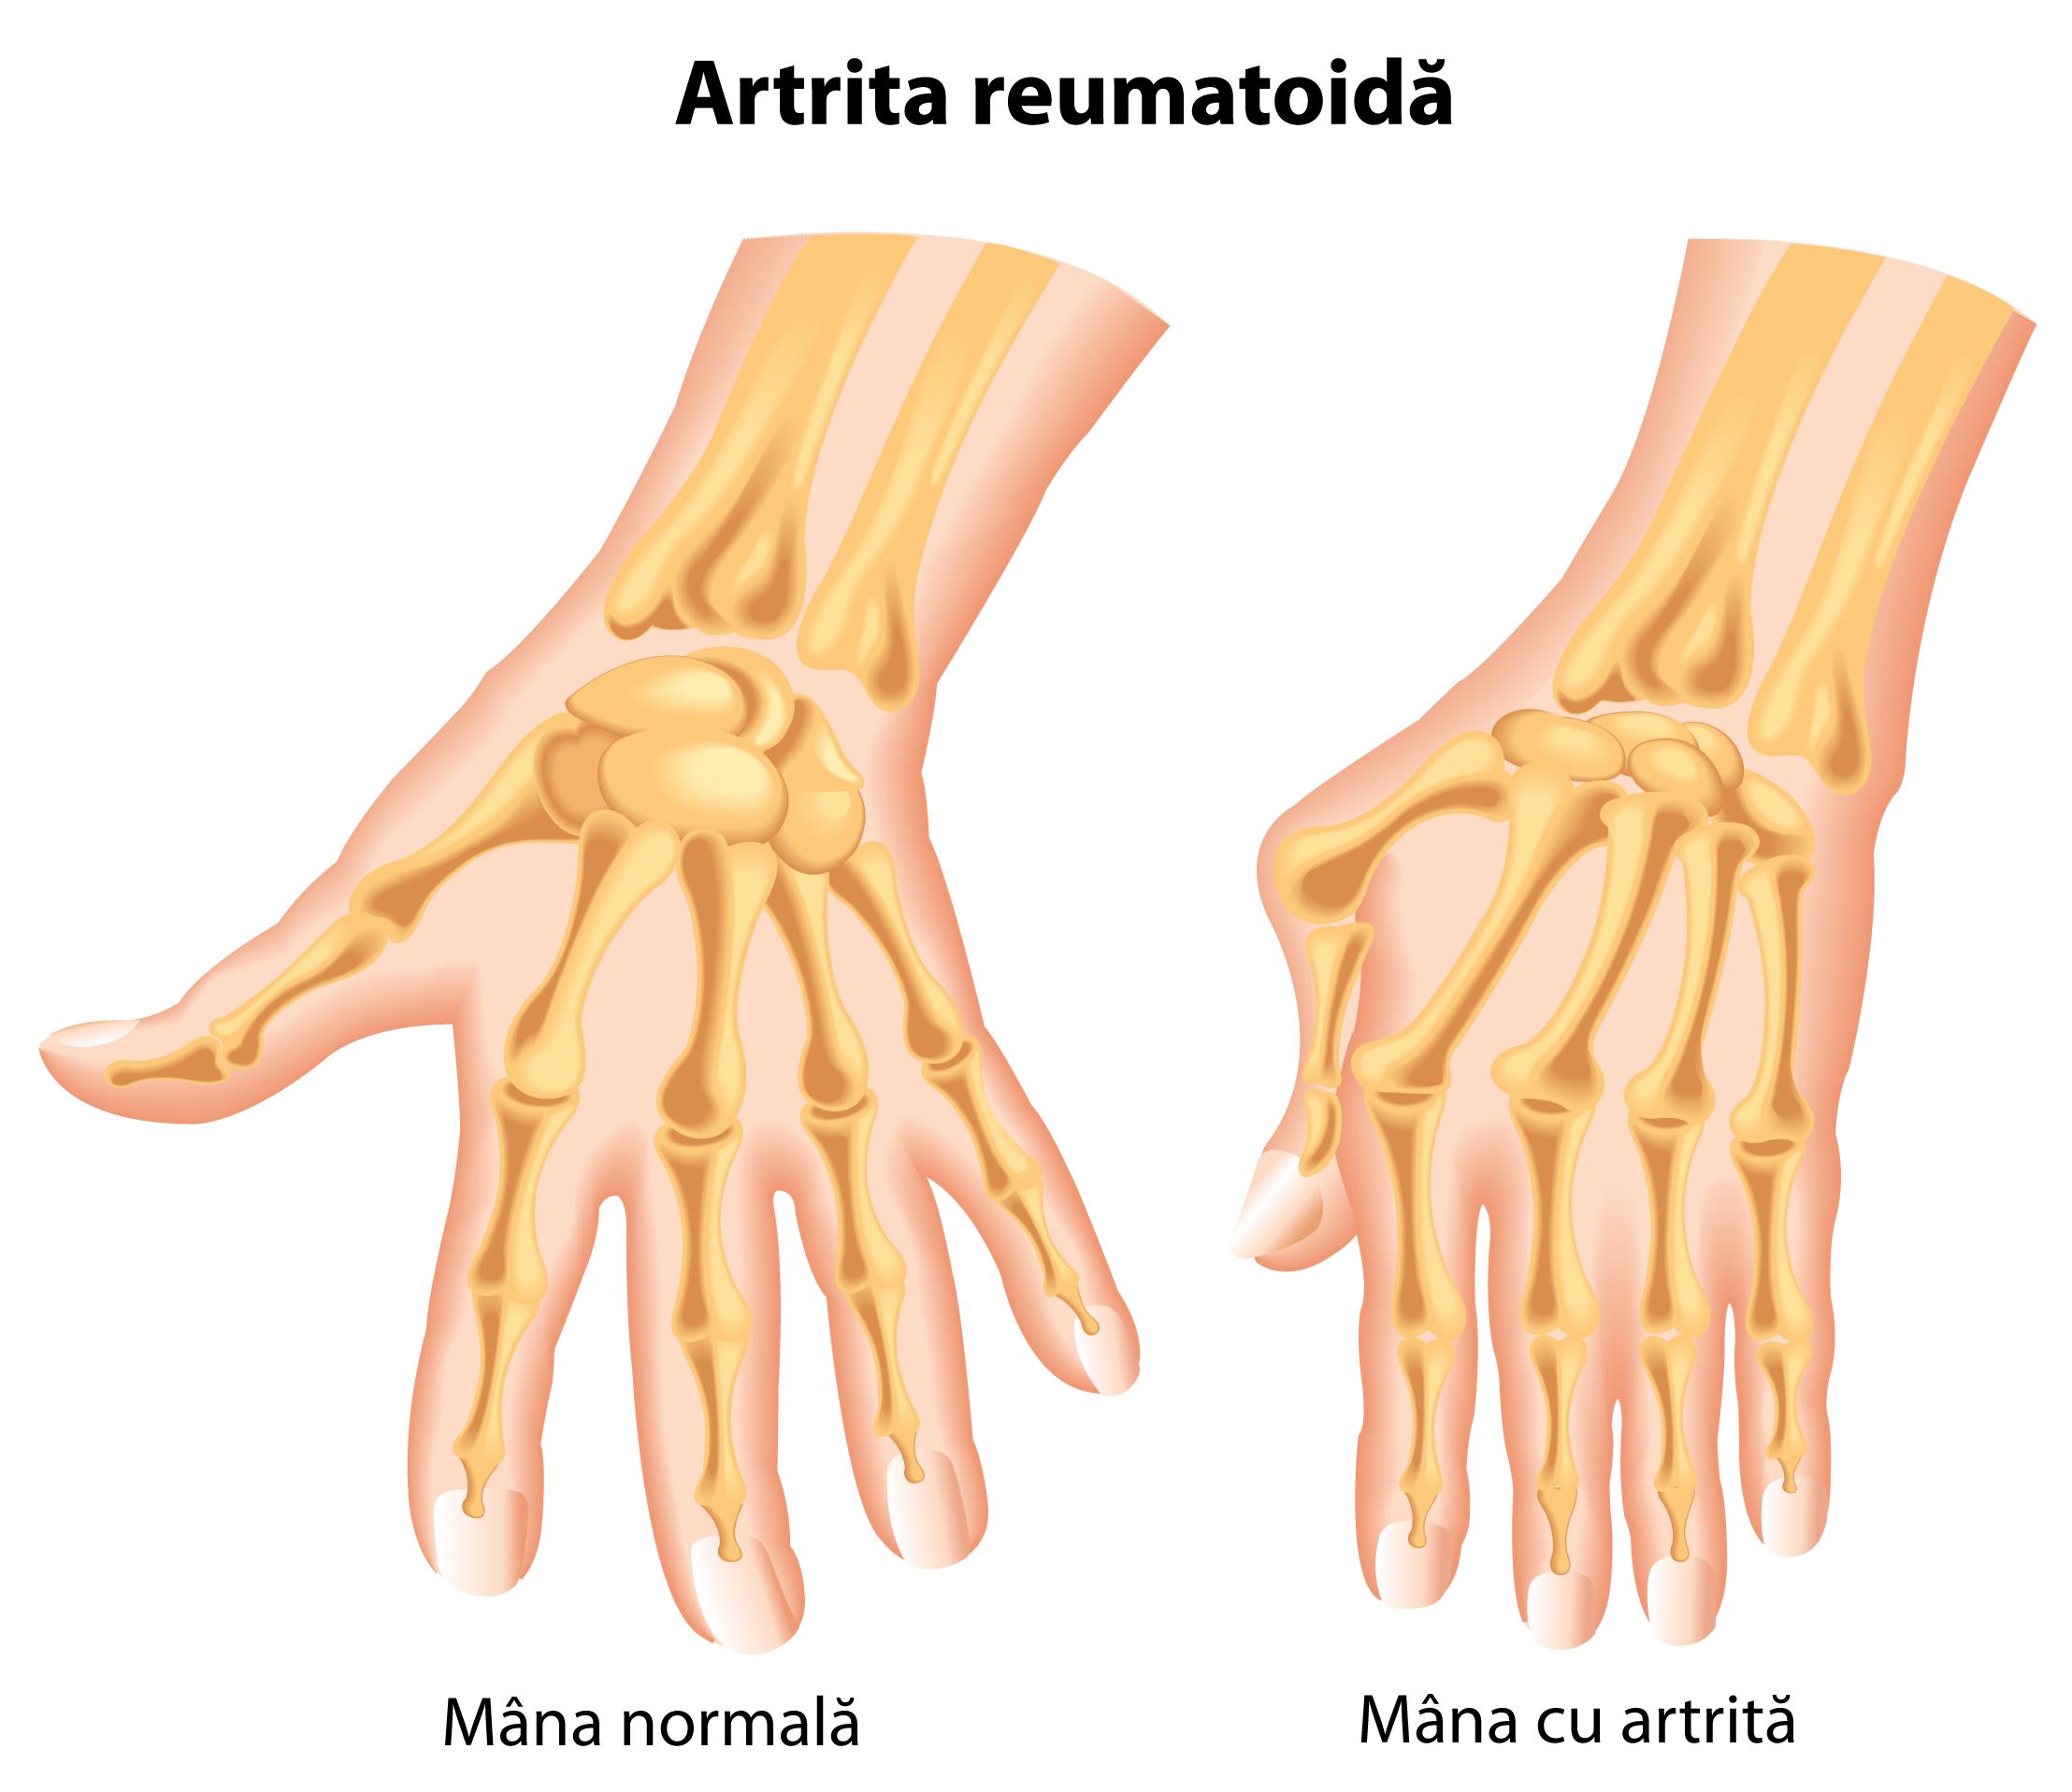 tratament medical pentru artroza degetelor